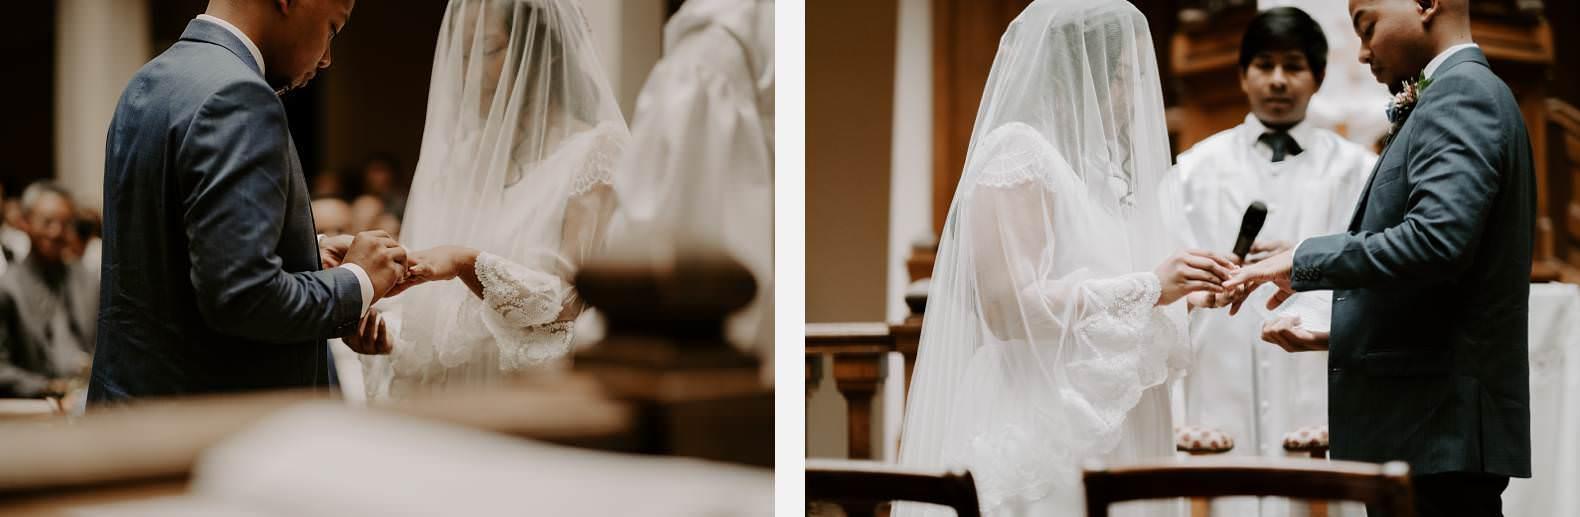 mariage manoir de corny photographe bel esprit 0028 1